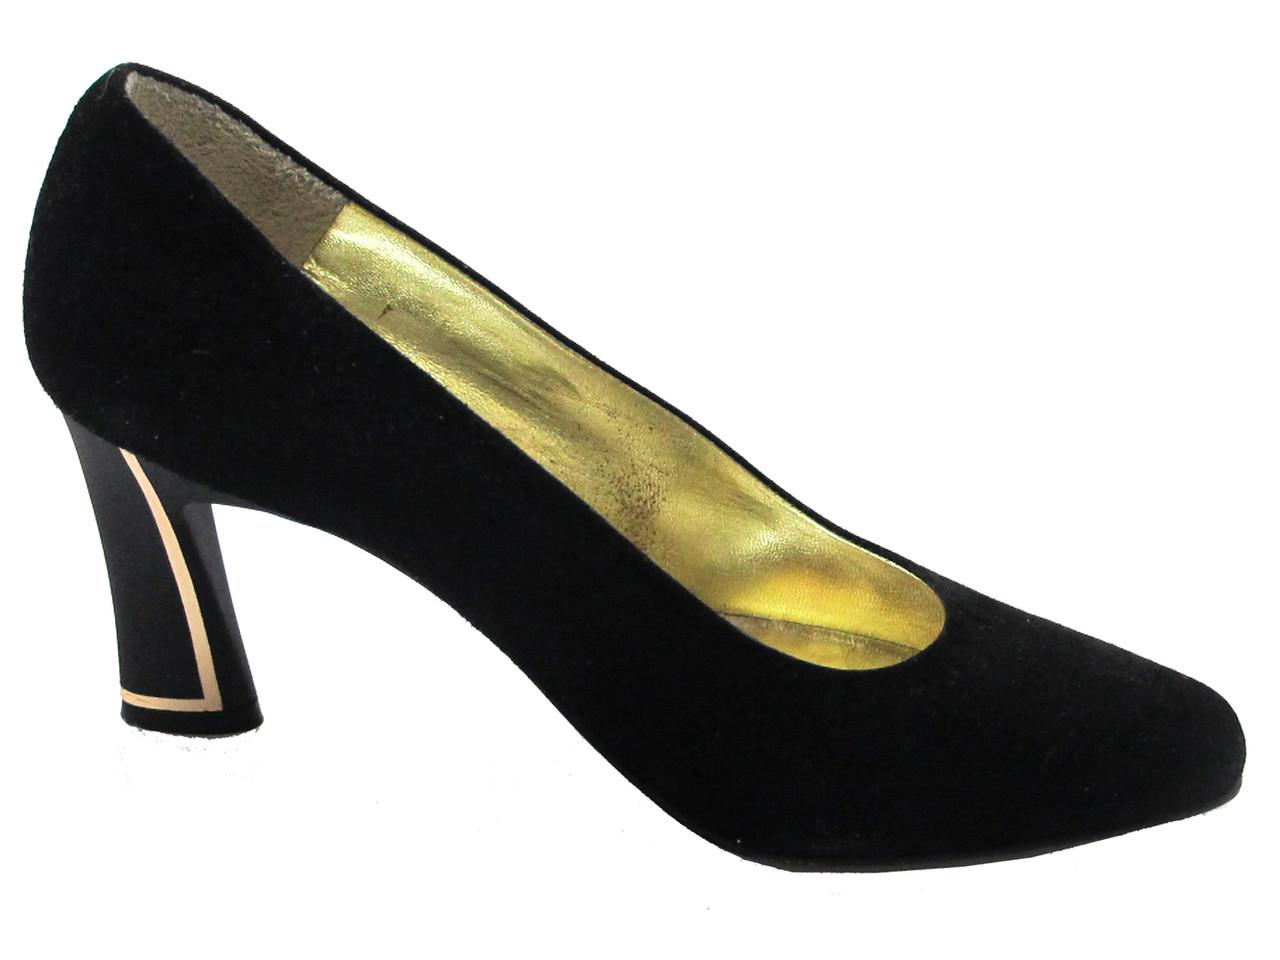 a60c846fa4d Linea Barbarella 1073 Women s Italian Mid Heel Pump In Black And Brown